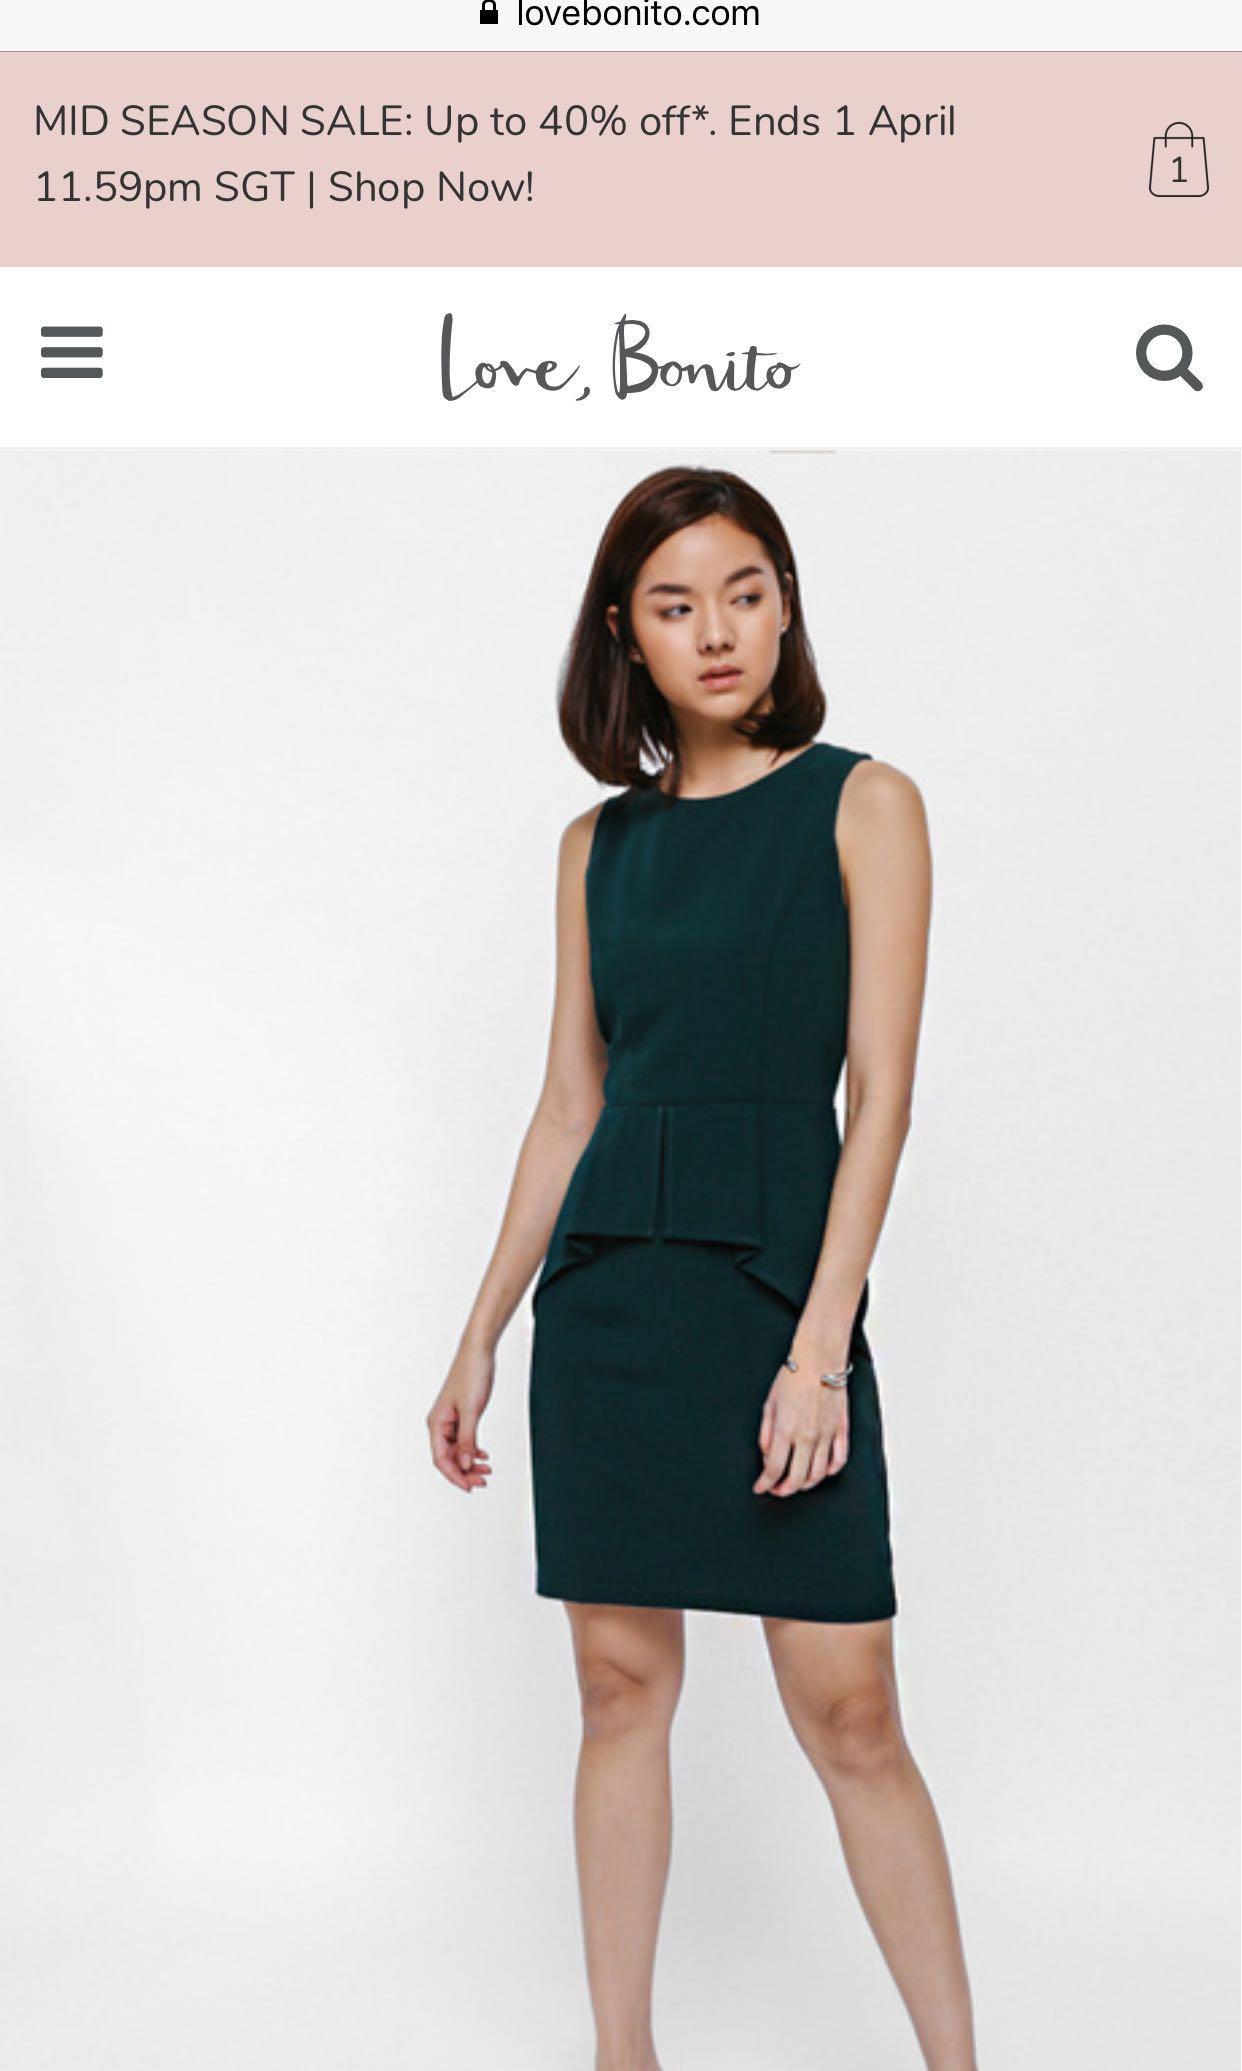 ca50a8115ad9 Lovebonito Helrene Origami Cascade Peplum Dress in Size M, Women's ...